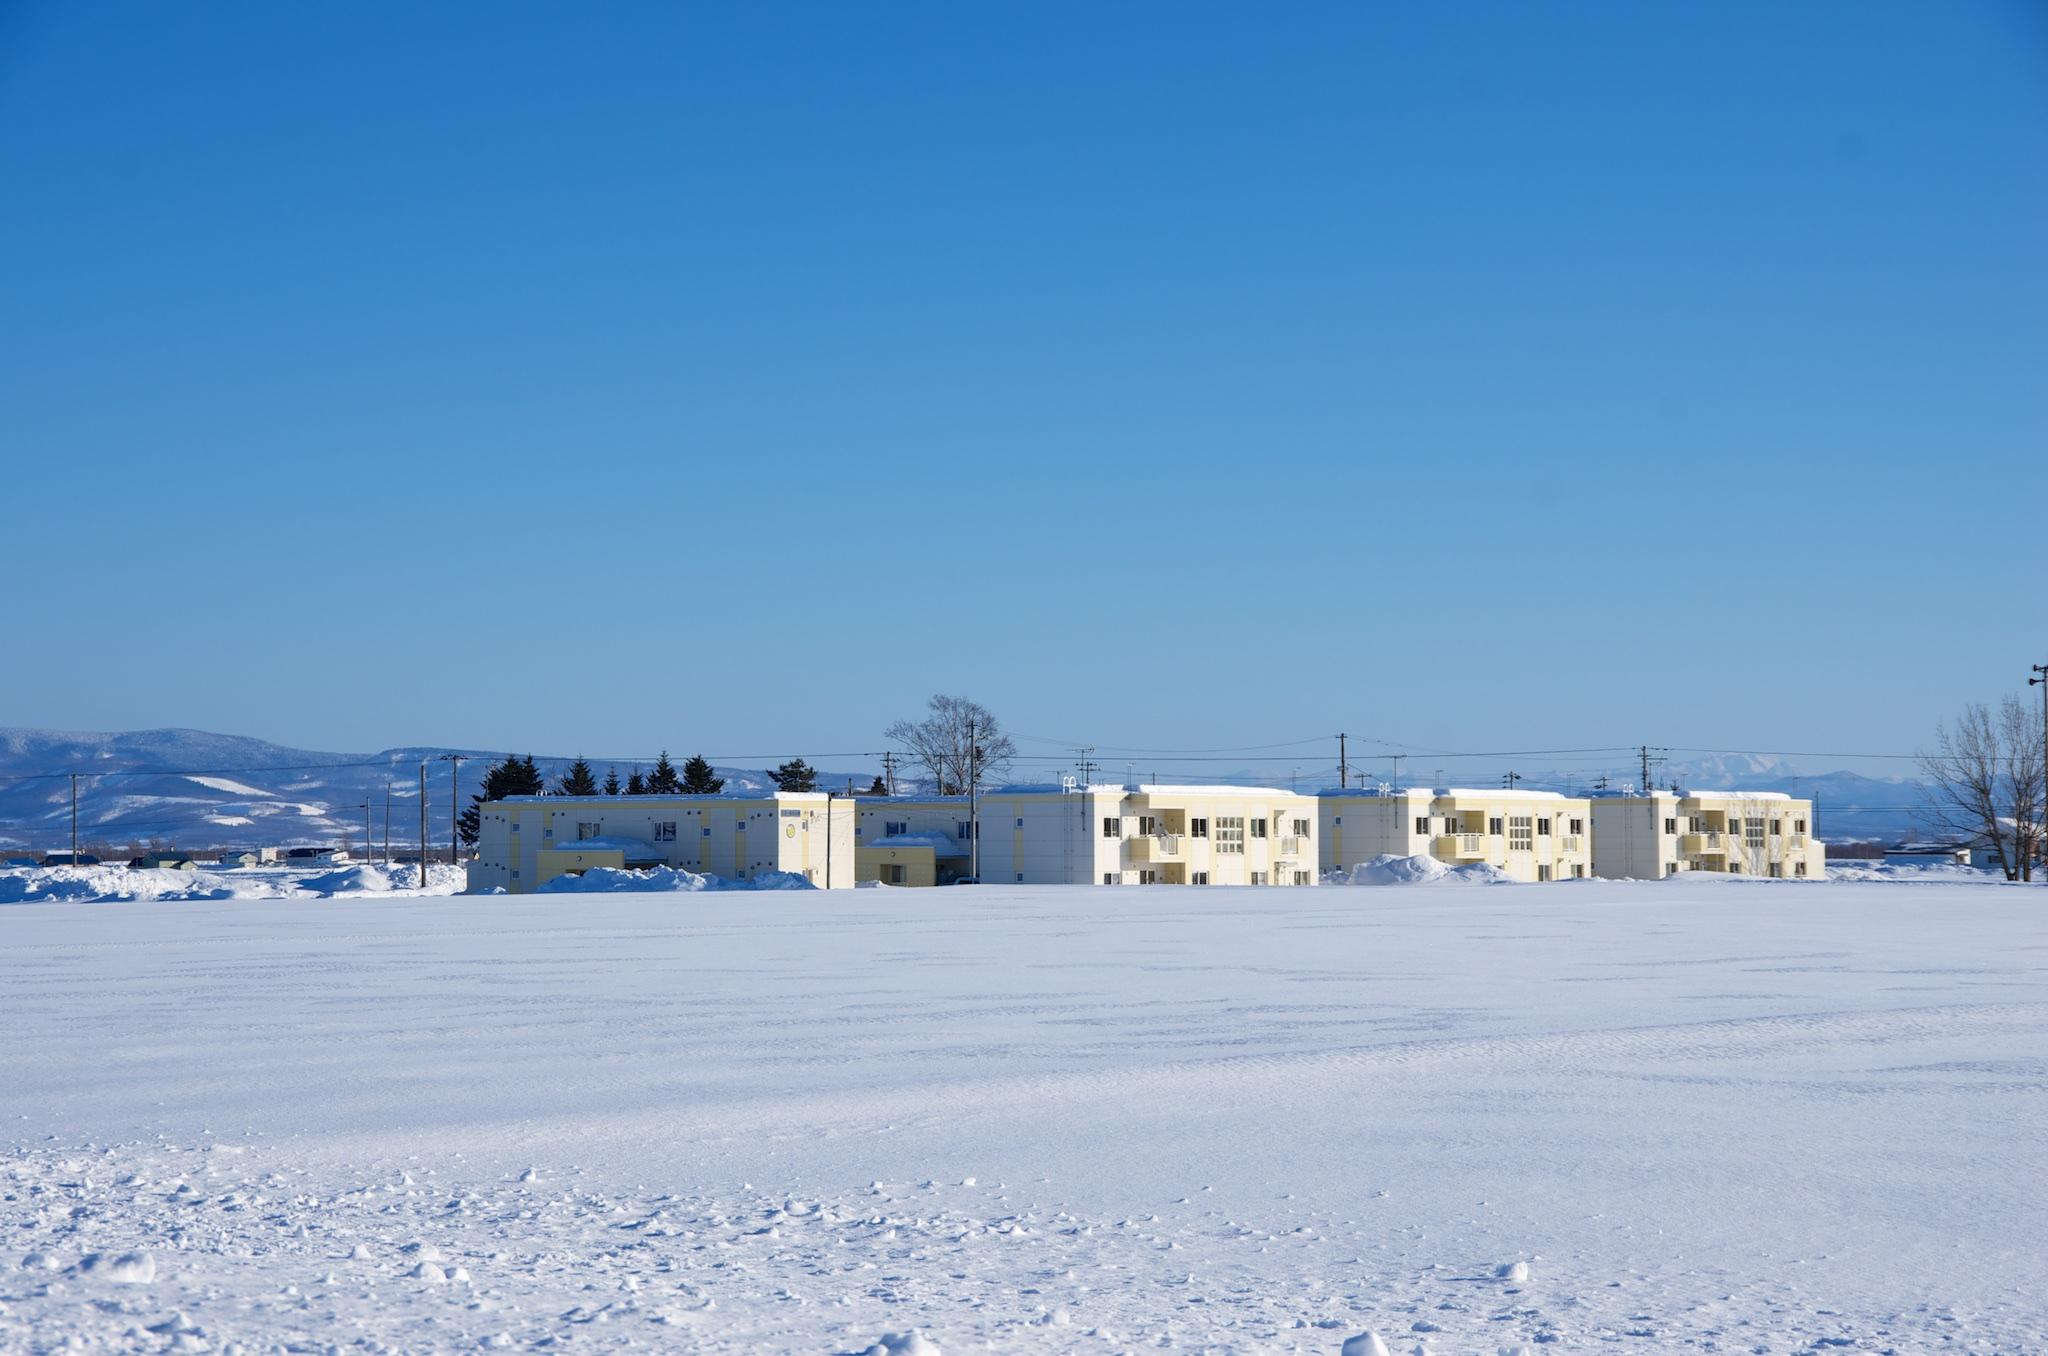 Photo: 北竜町の景色・2015年2月